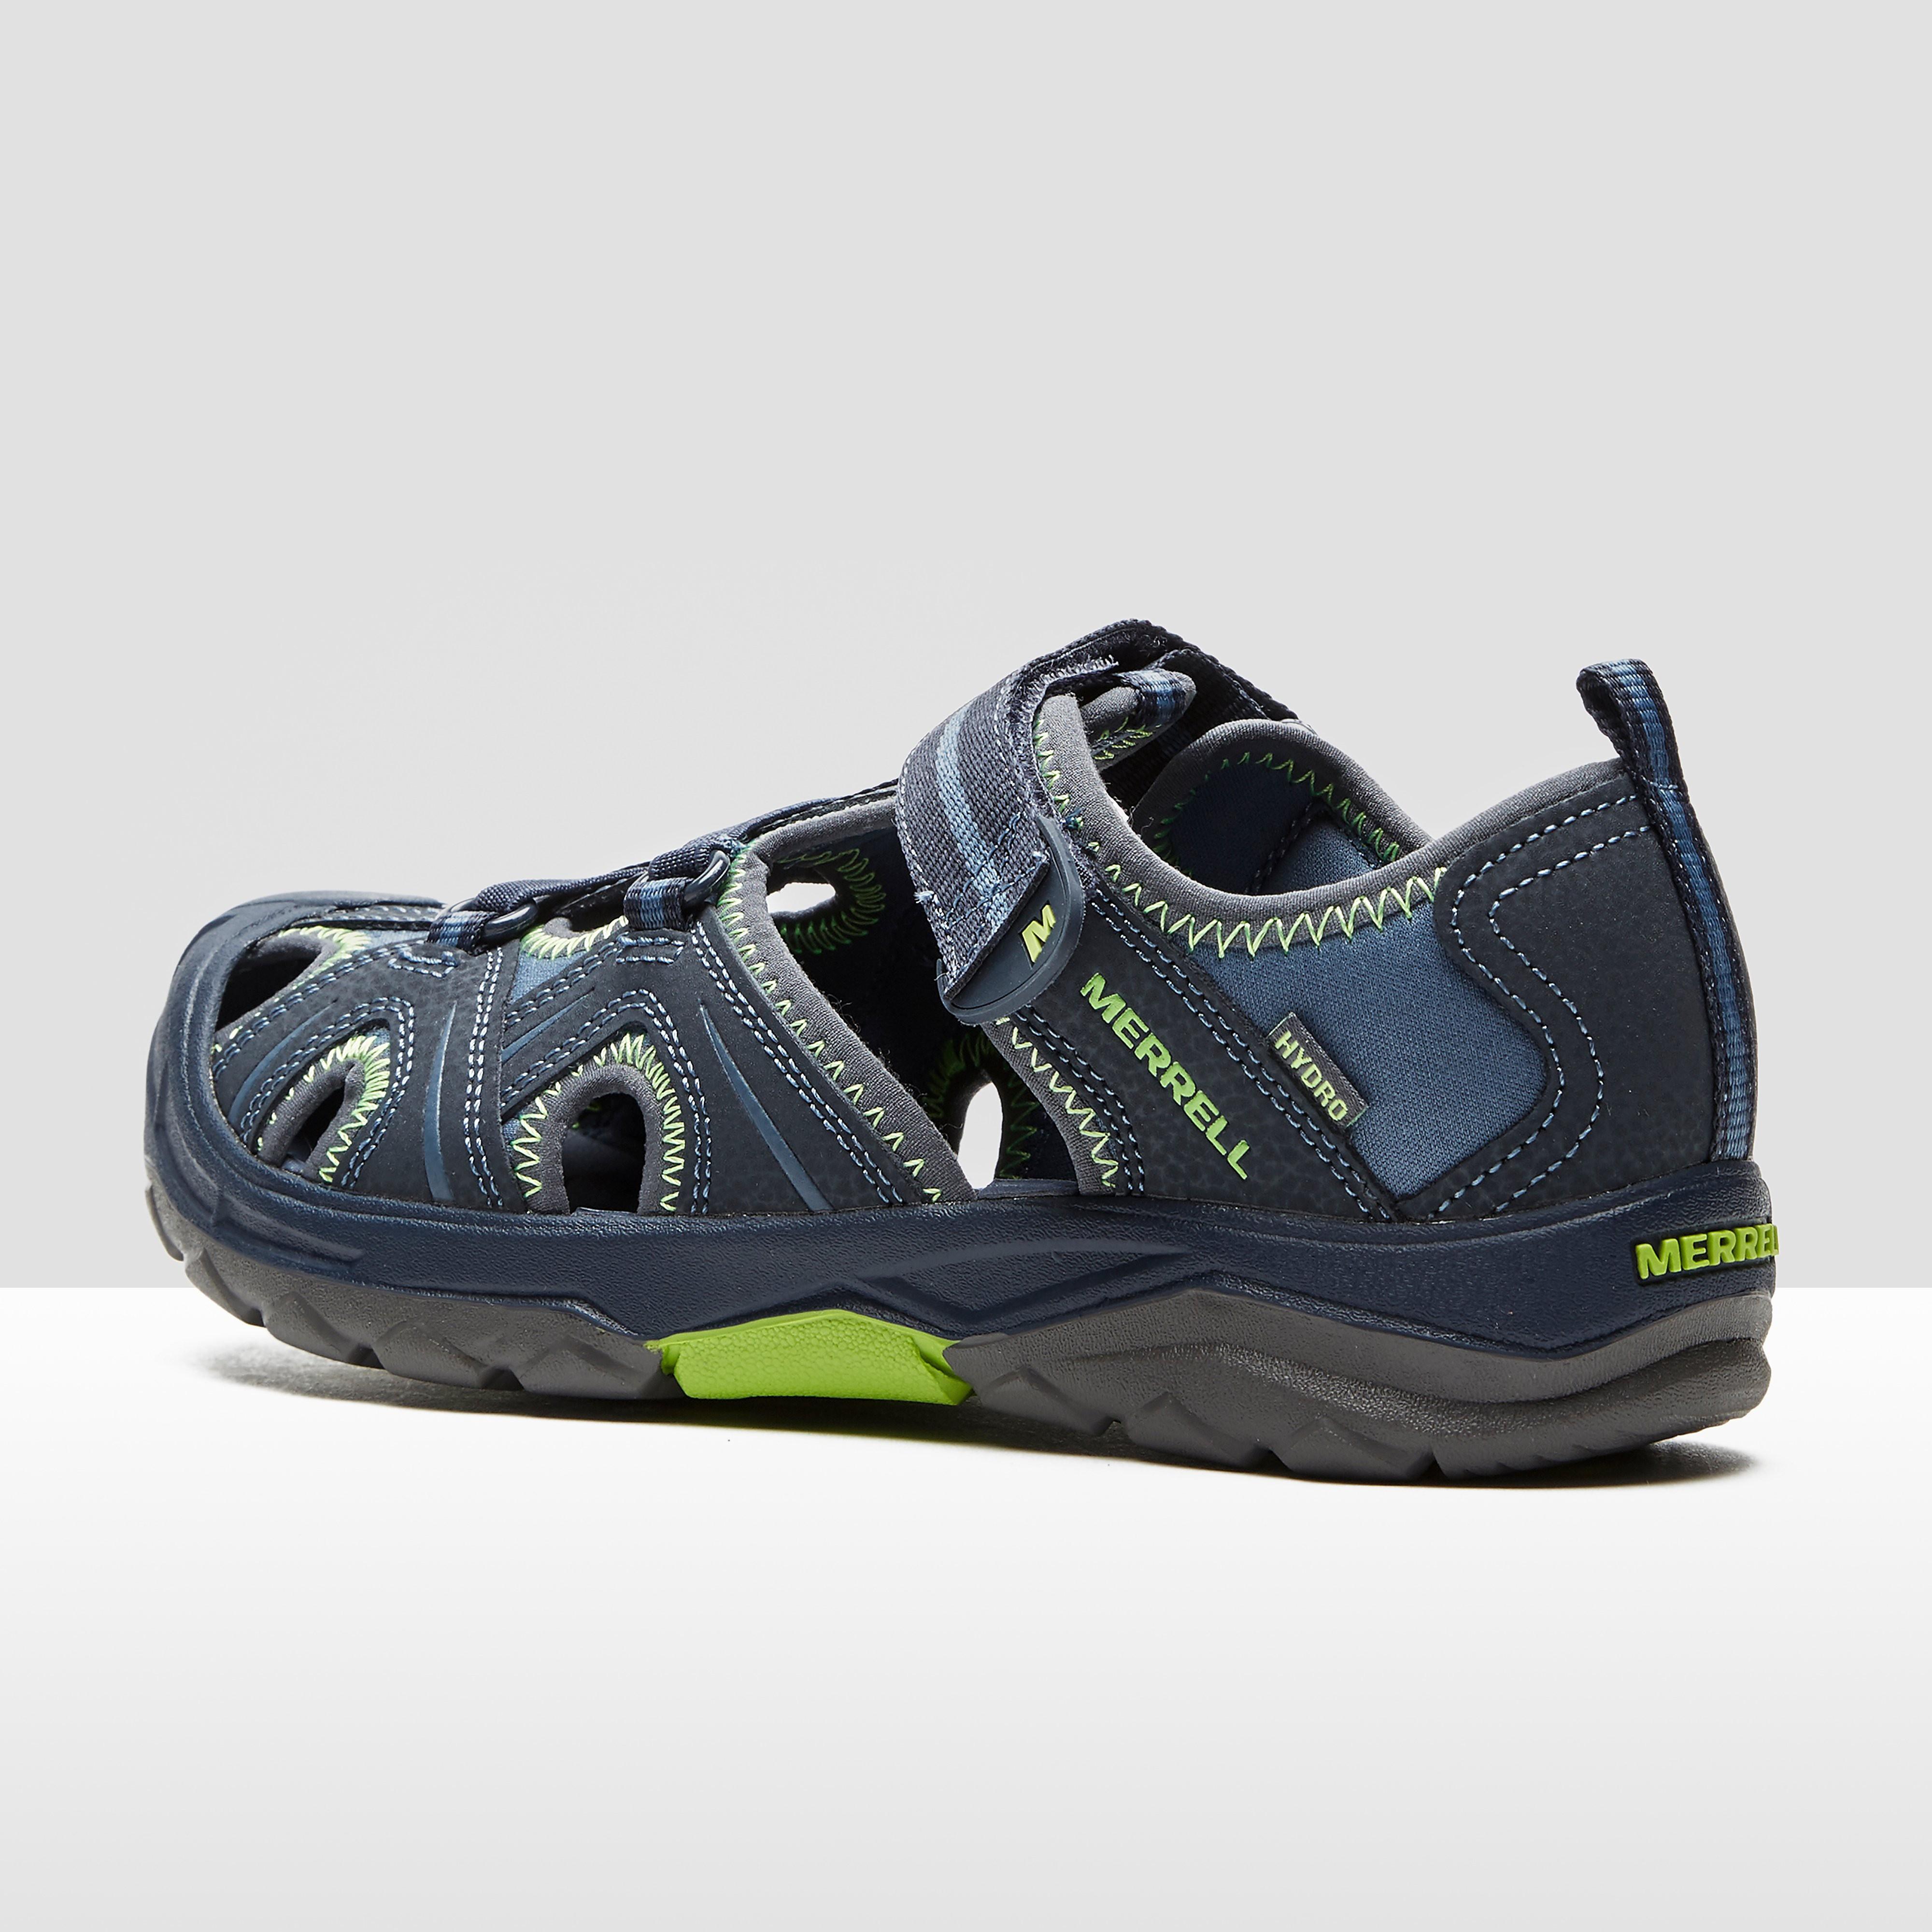 Merrell Hydro Boy's Sandals